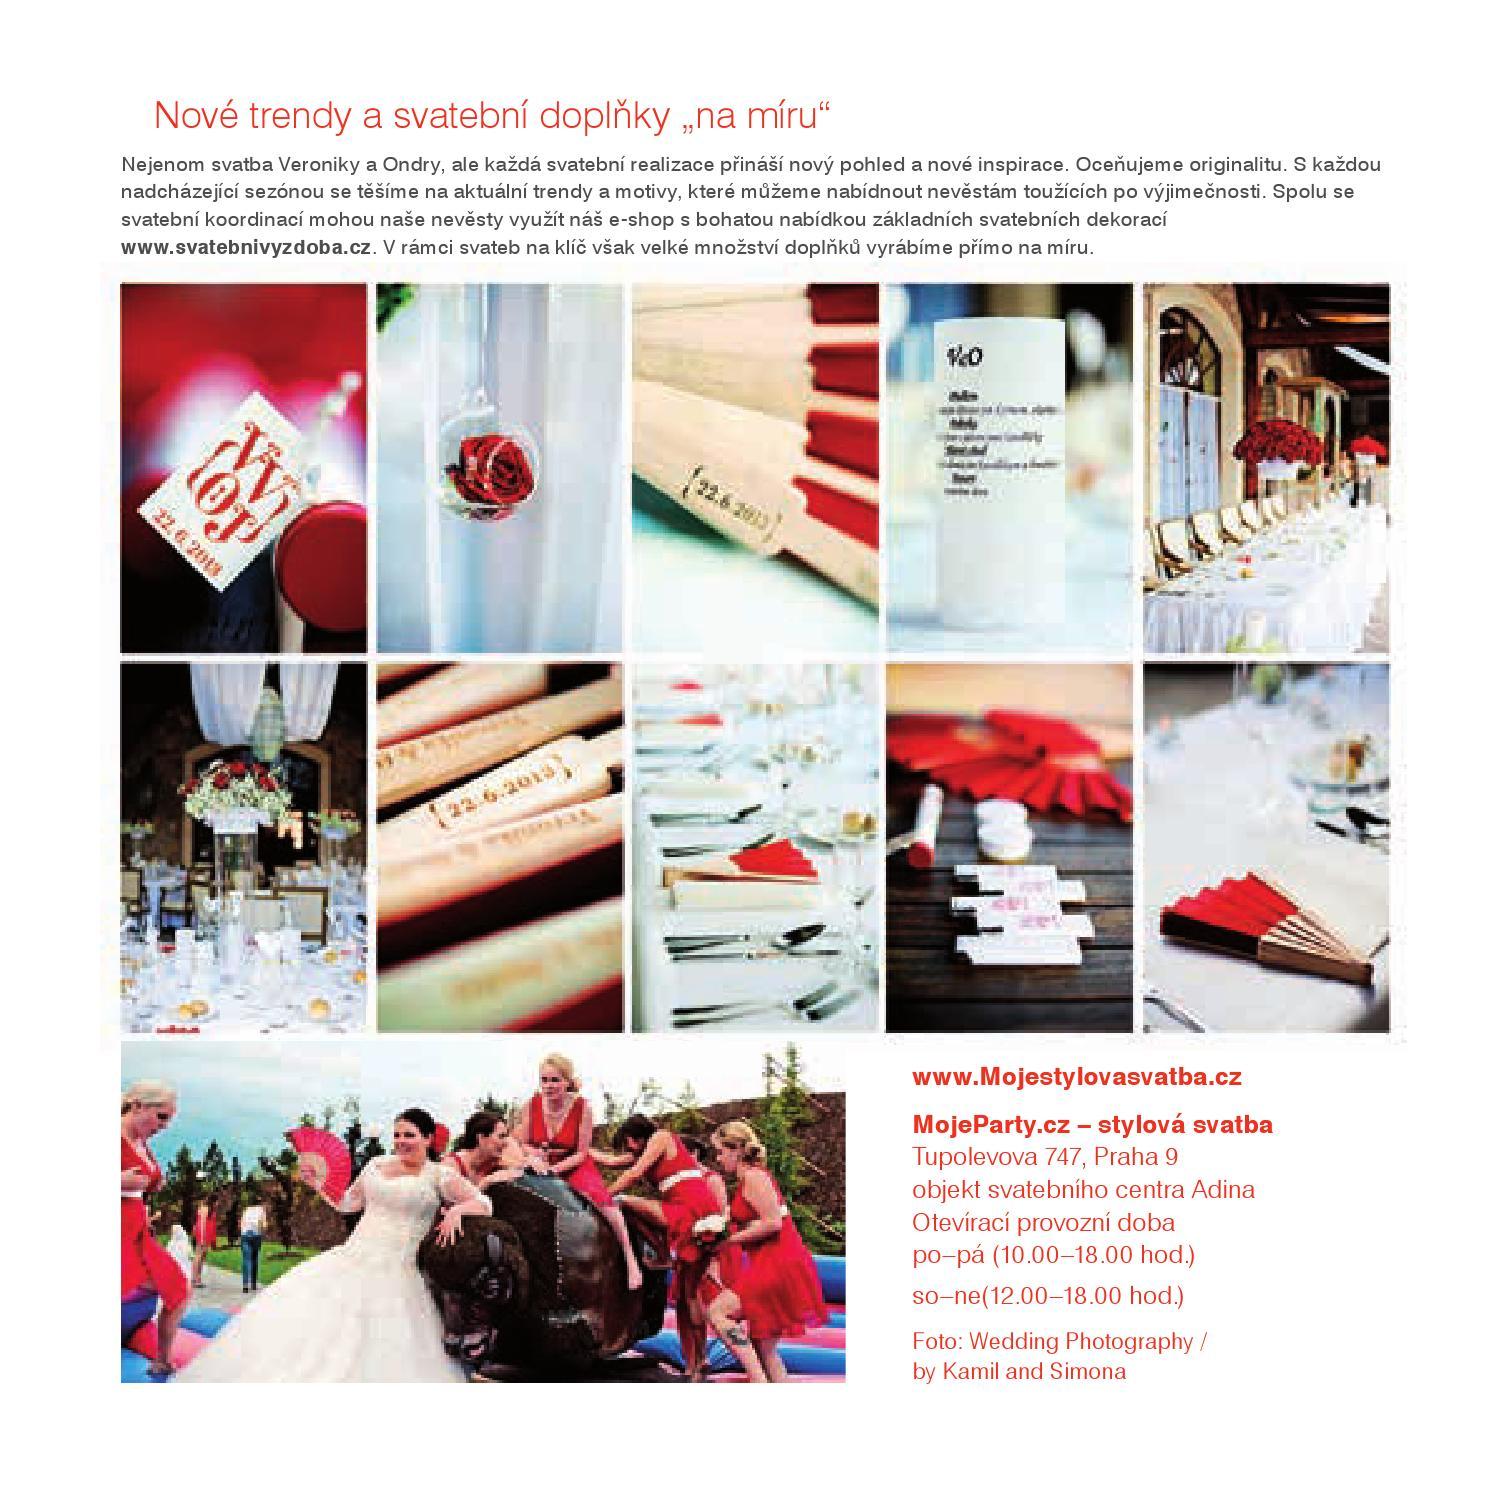 Marriage Guide Podzim 2014 By Kollman Partners S R O Issuu